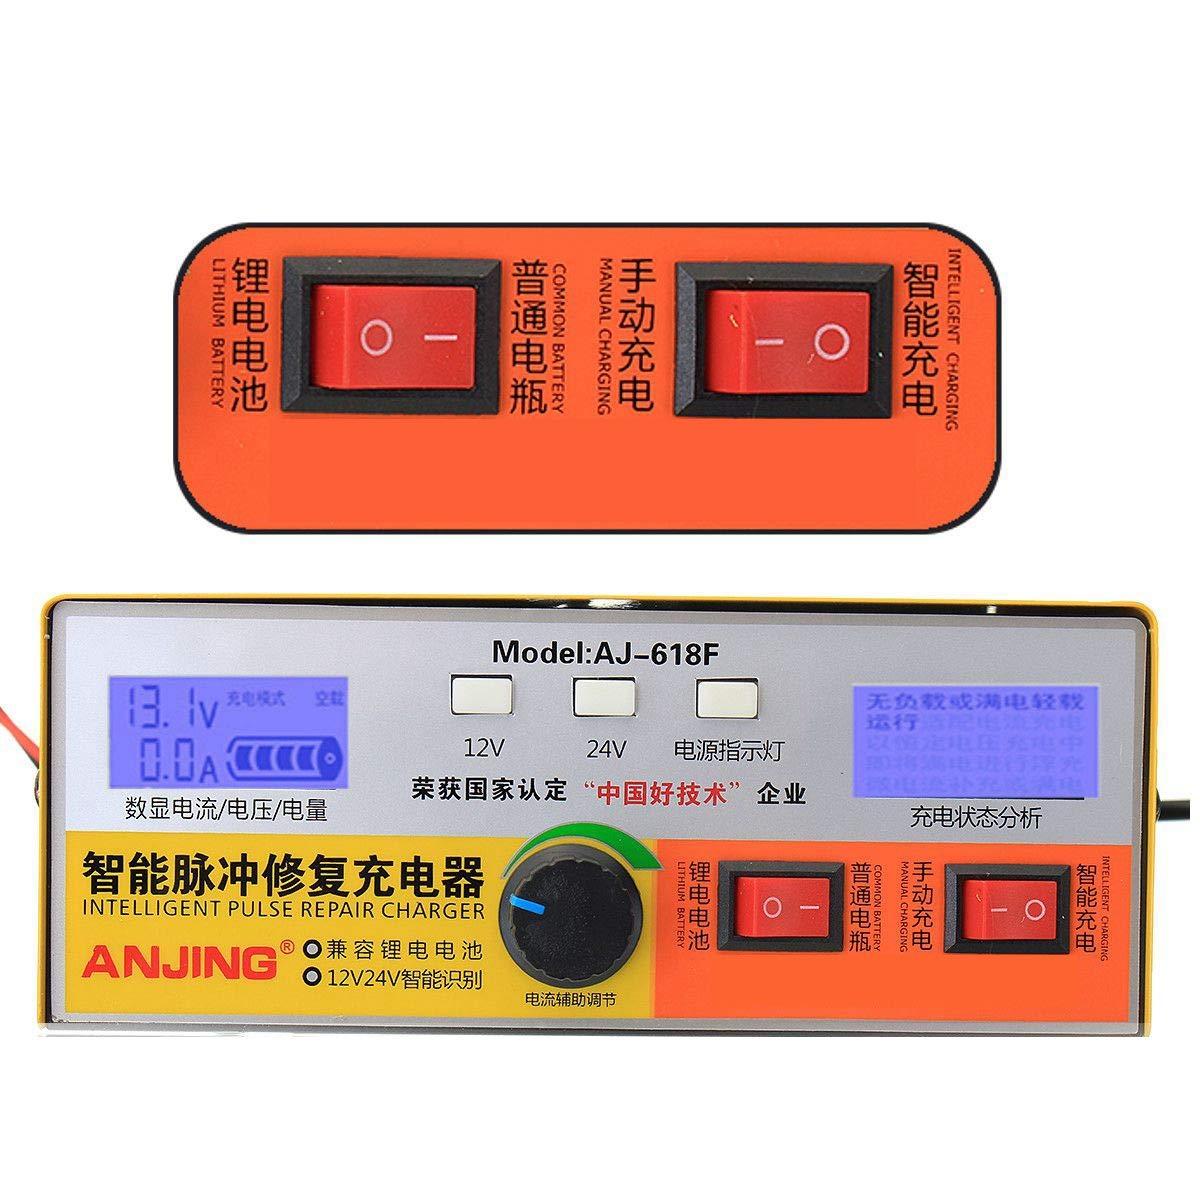 TOOGOO Automatic Intelligent Pulse Repair Type 12V//24V 400Ah Car Battery Charger Aj-618